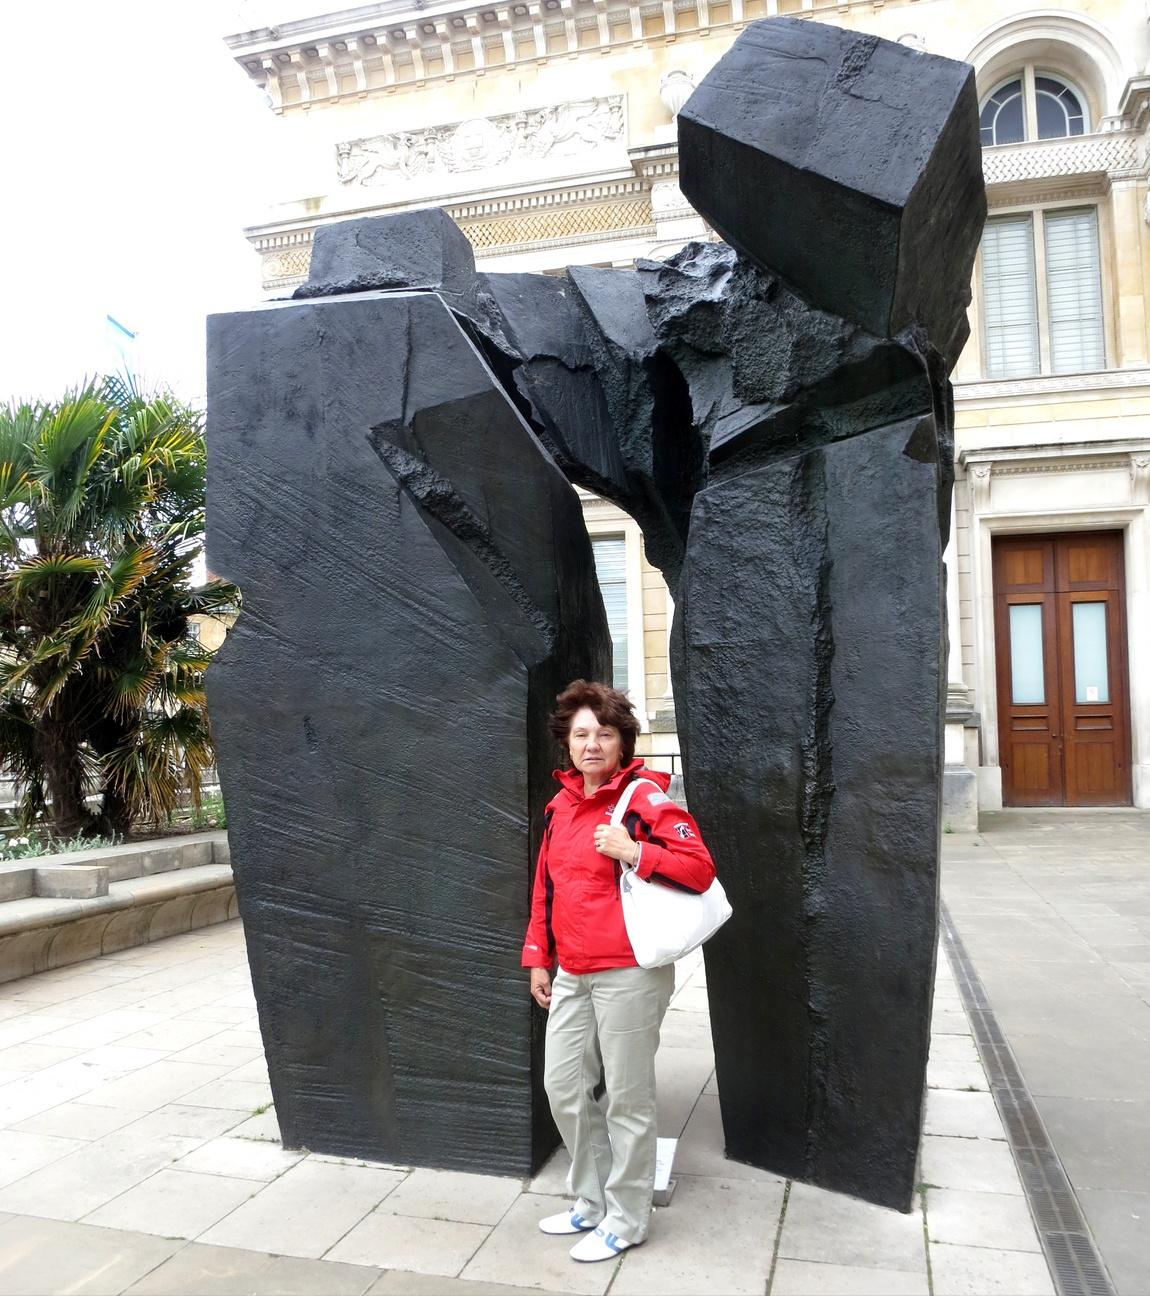 У музея Эшмола (Ashmolean Museum) - абстрактная композиция